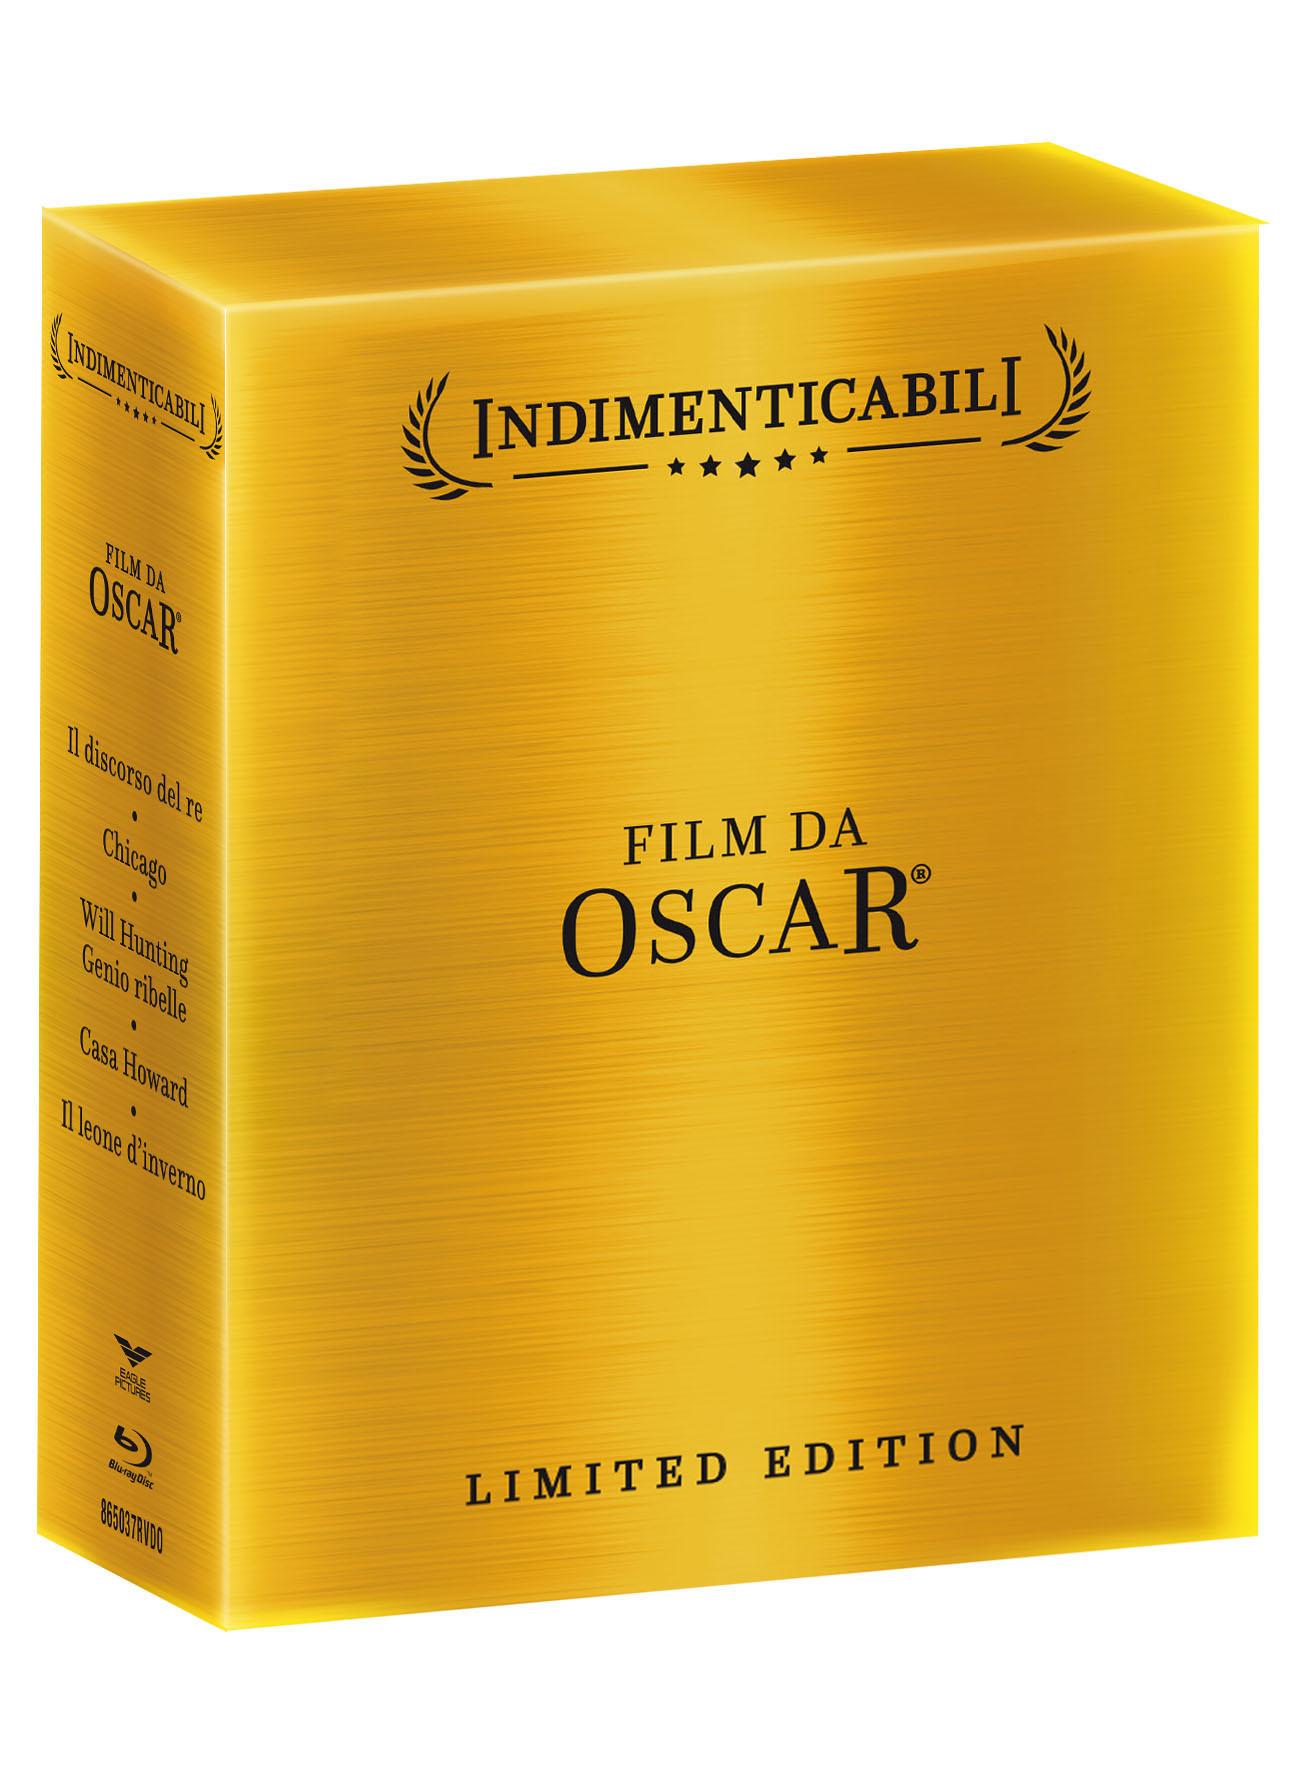 COF.FILM DA OSCAR - COFANETTO INDIMENTICABILI (5 BLU-RAY)